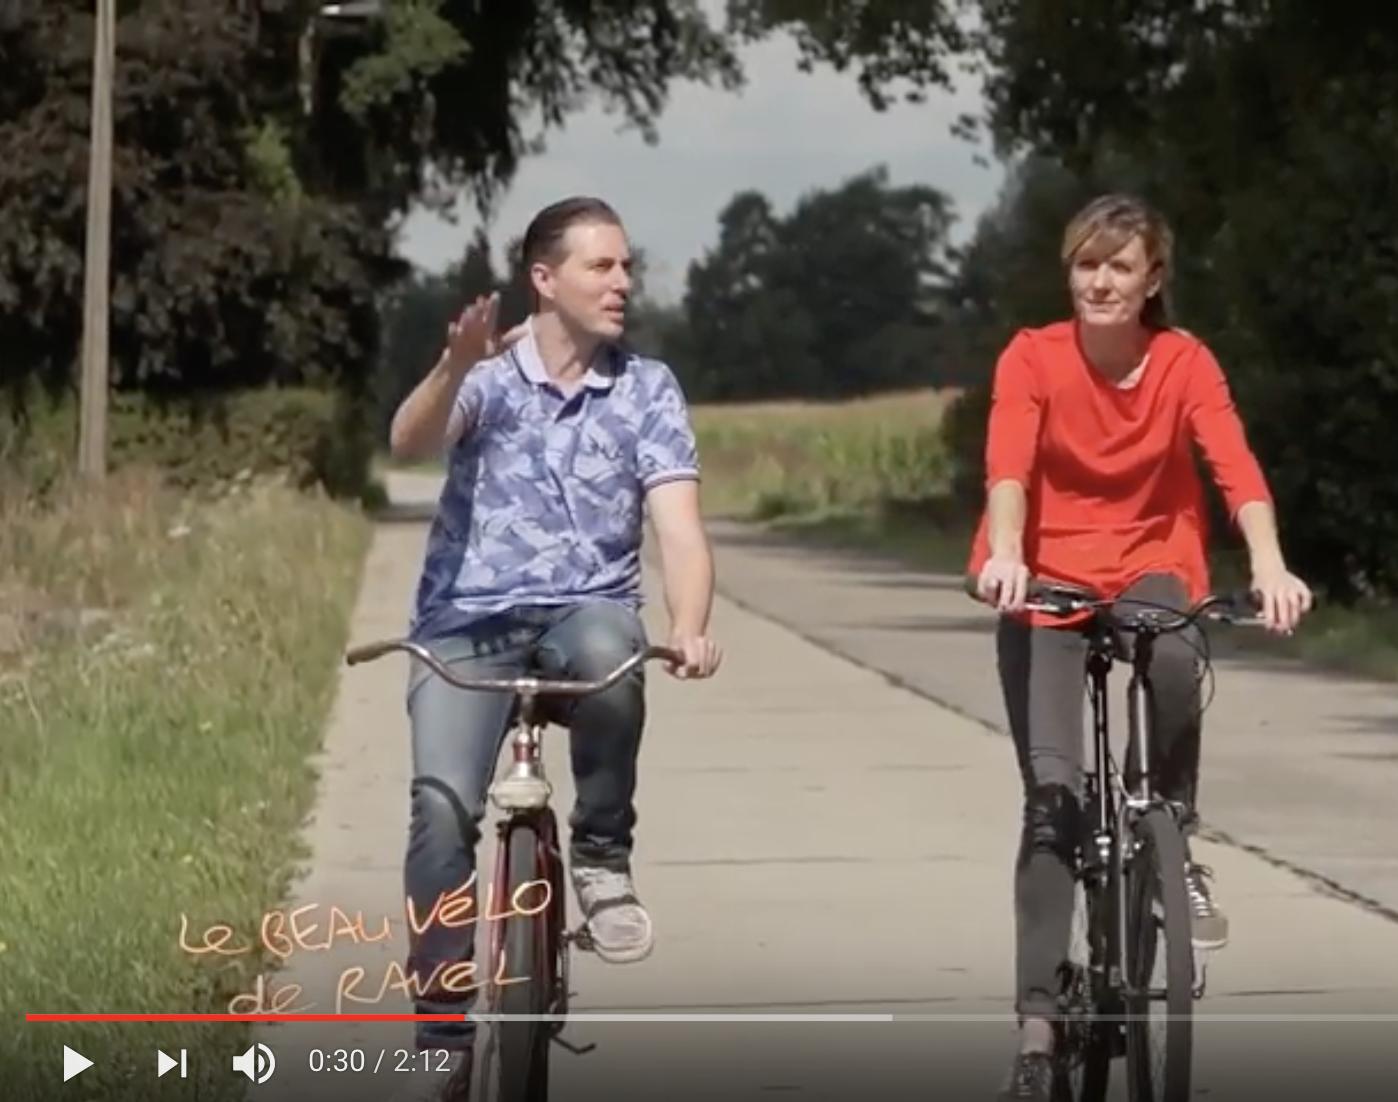 Beau Vélo de Ravel Rumes 2017, Tumbleweedcycles, tumbleweed cycles